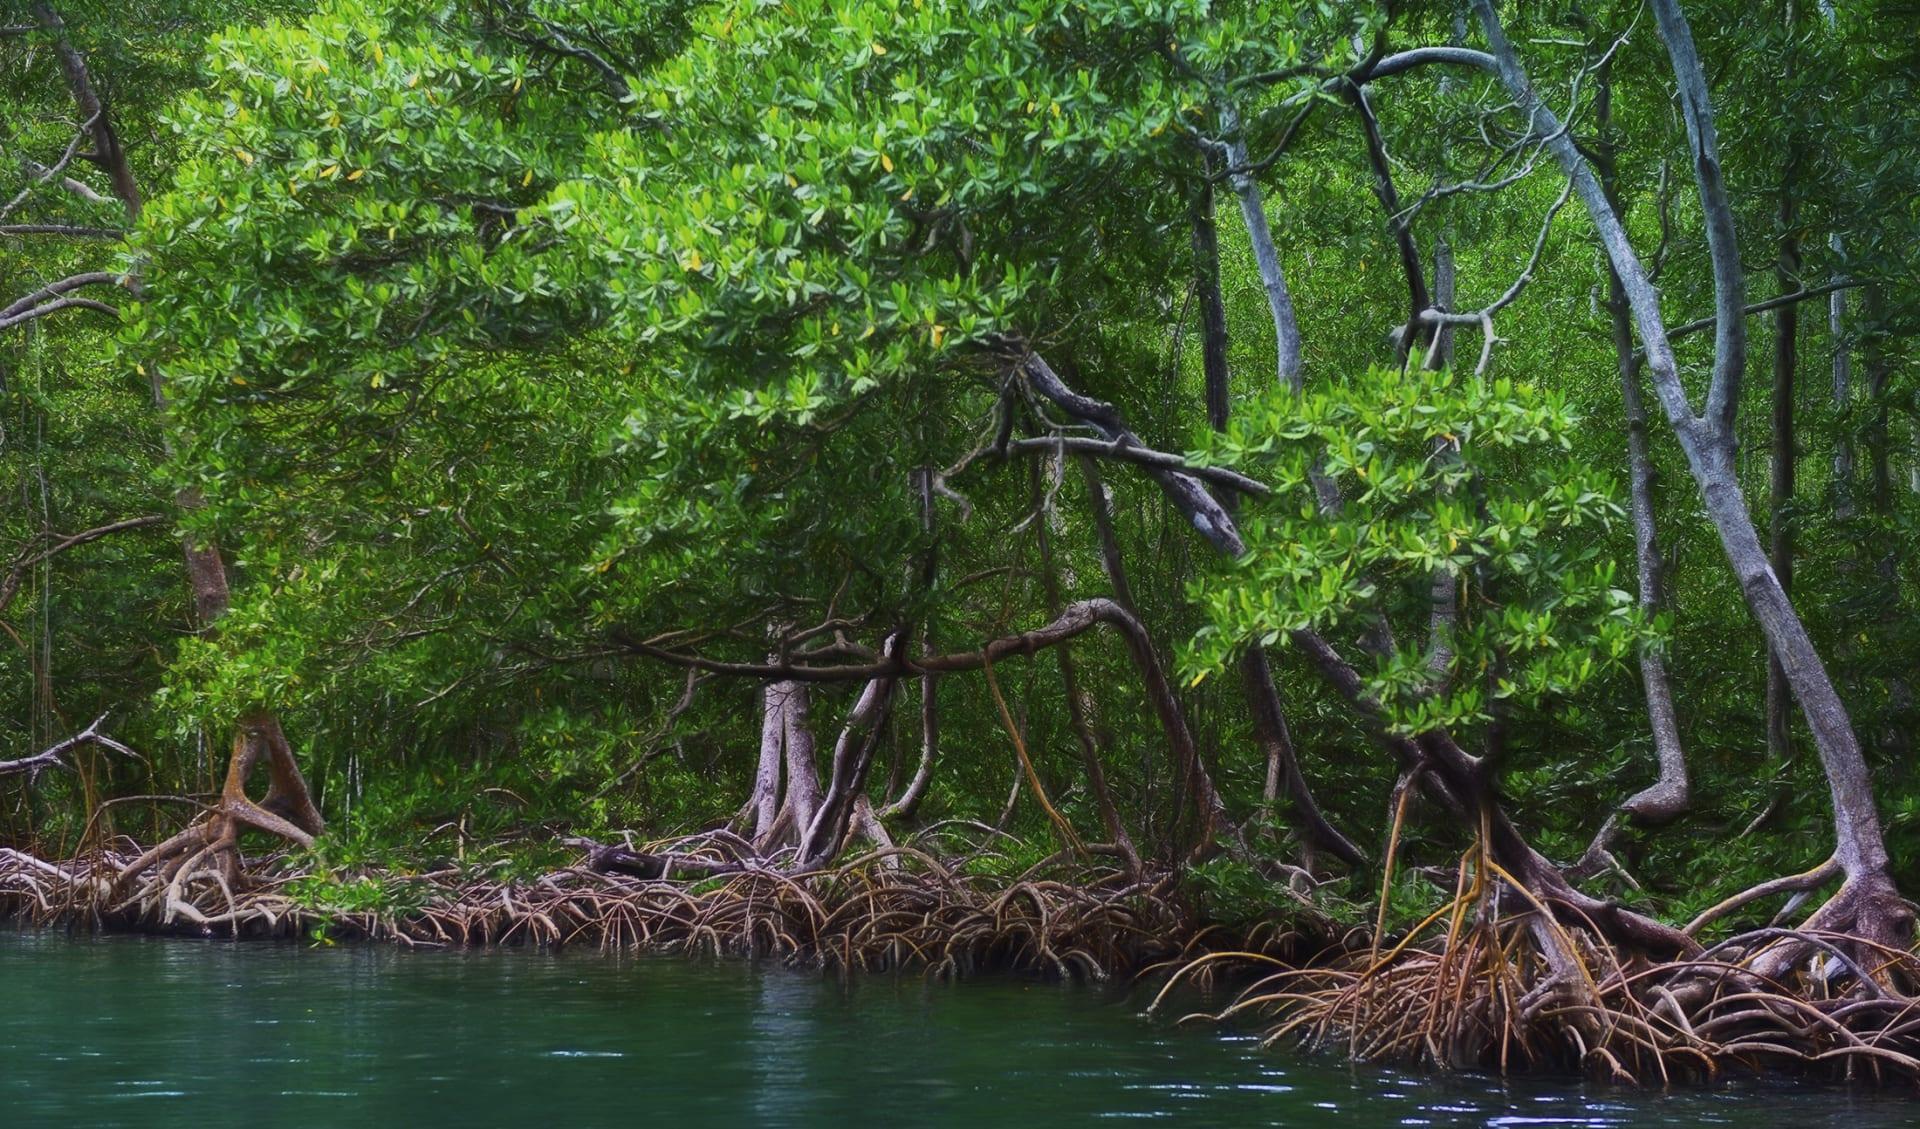 Mangrove, Los Haitises National Park, Bird Island, Dominican Republic, digital art, paint effect